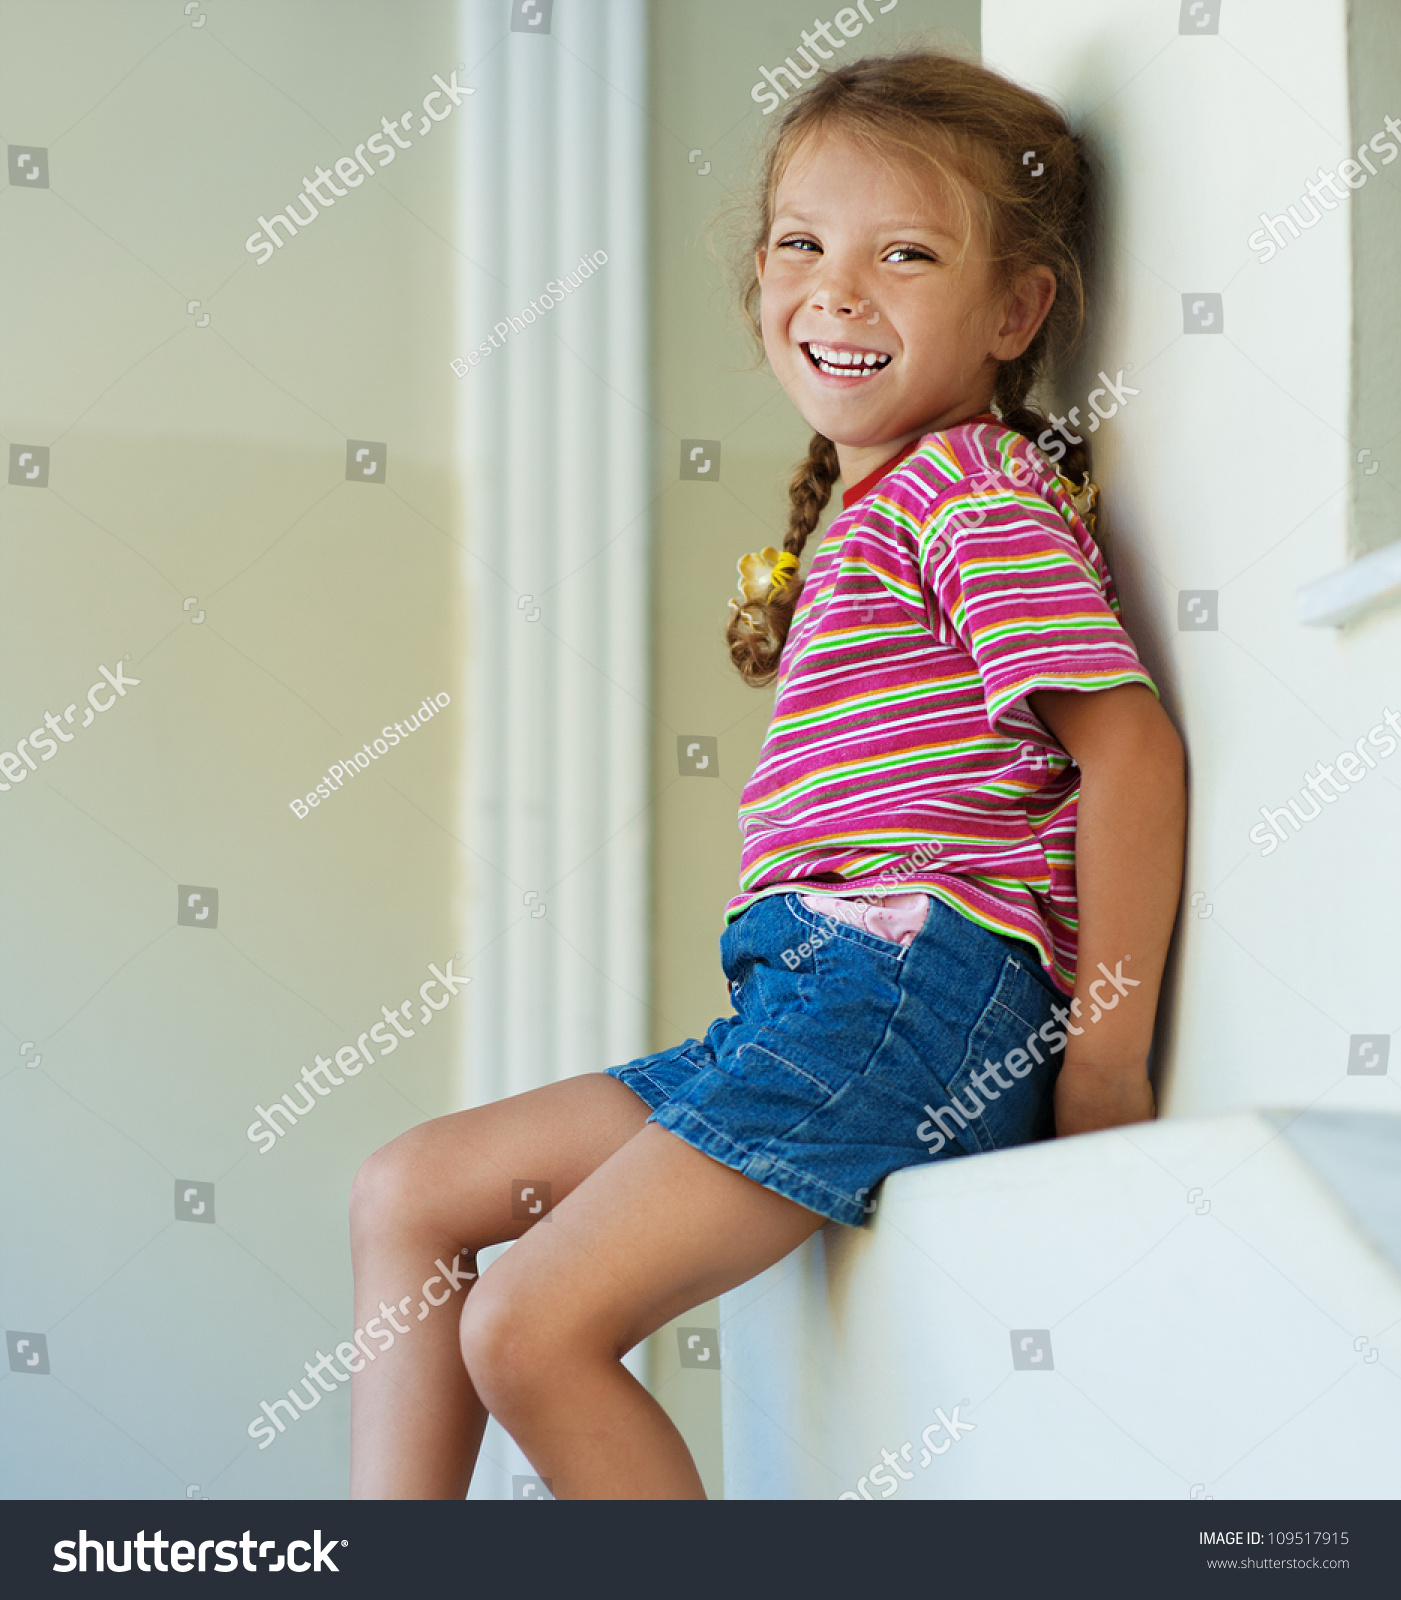 Beautiful Little Girl Bedrooms: Beautiful Little Girl In Shorts Sitting On Stone Ledge